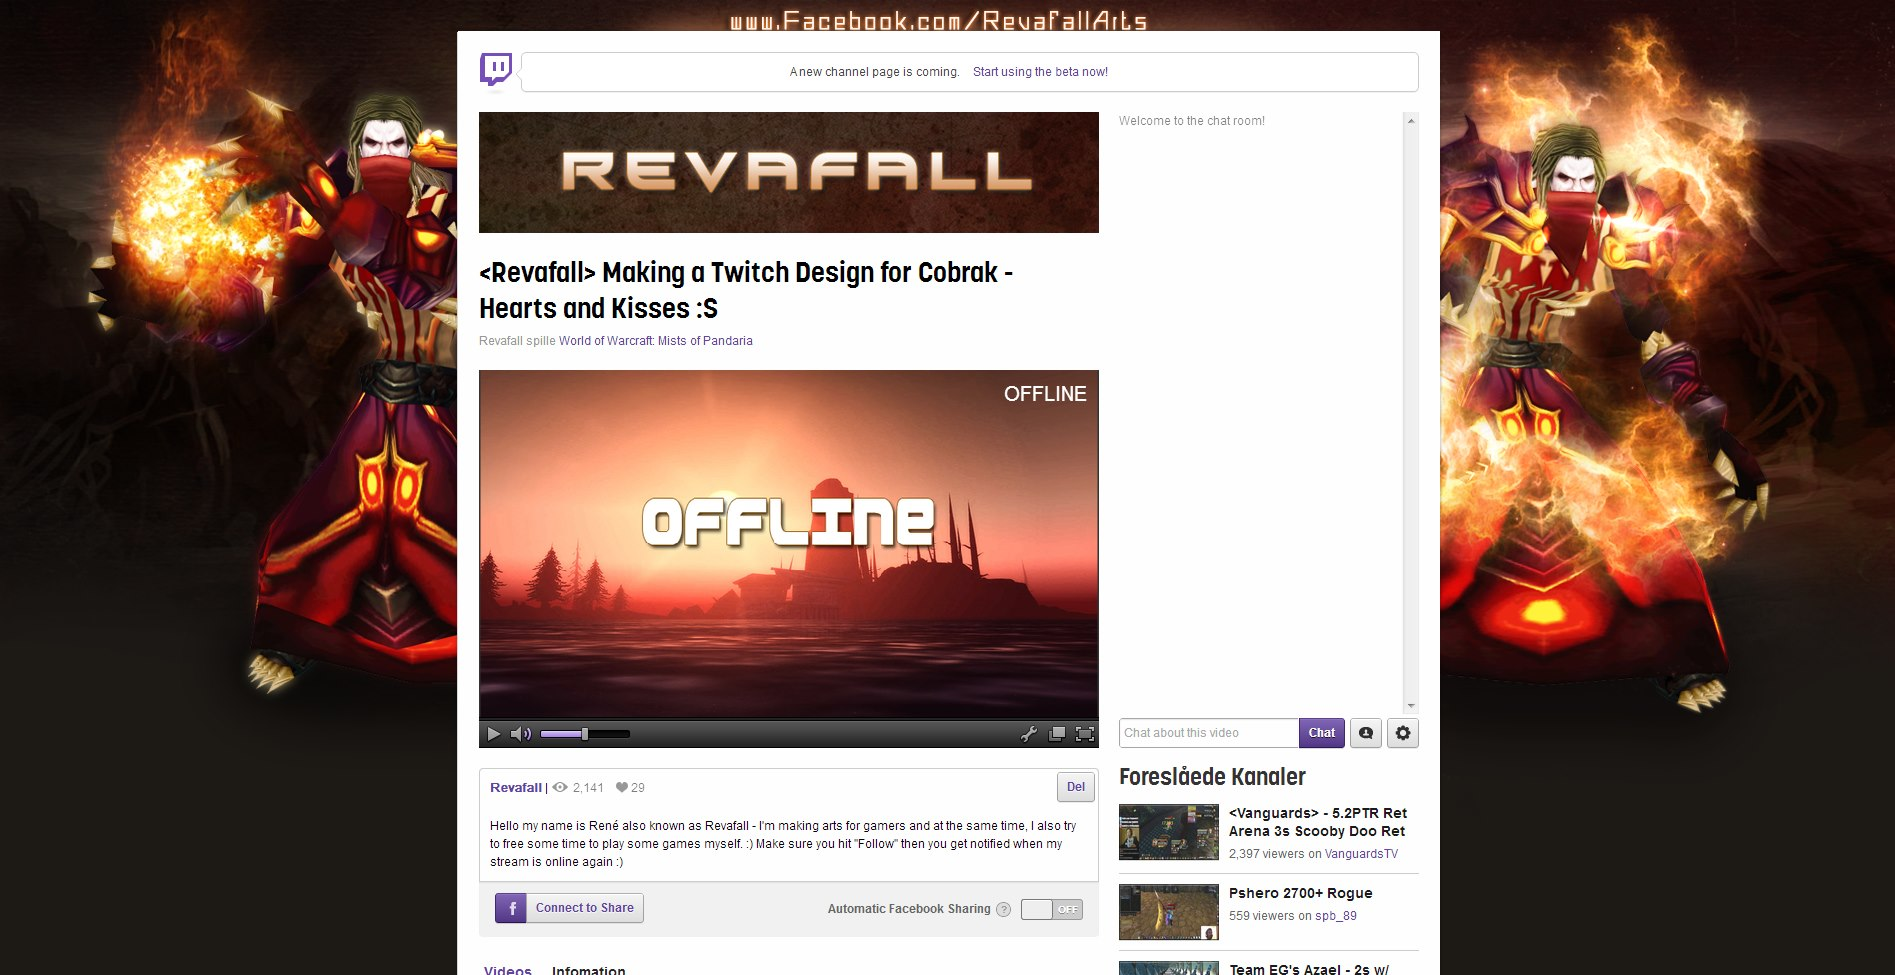 Revafall Twitch tv Design/Layout 2013 by RevafallArts on DeviantArt